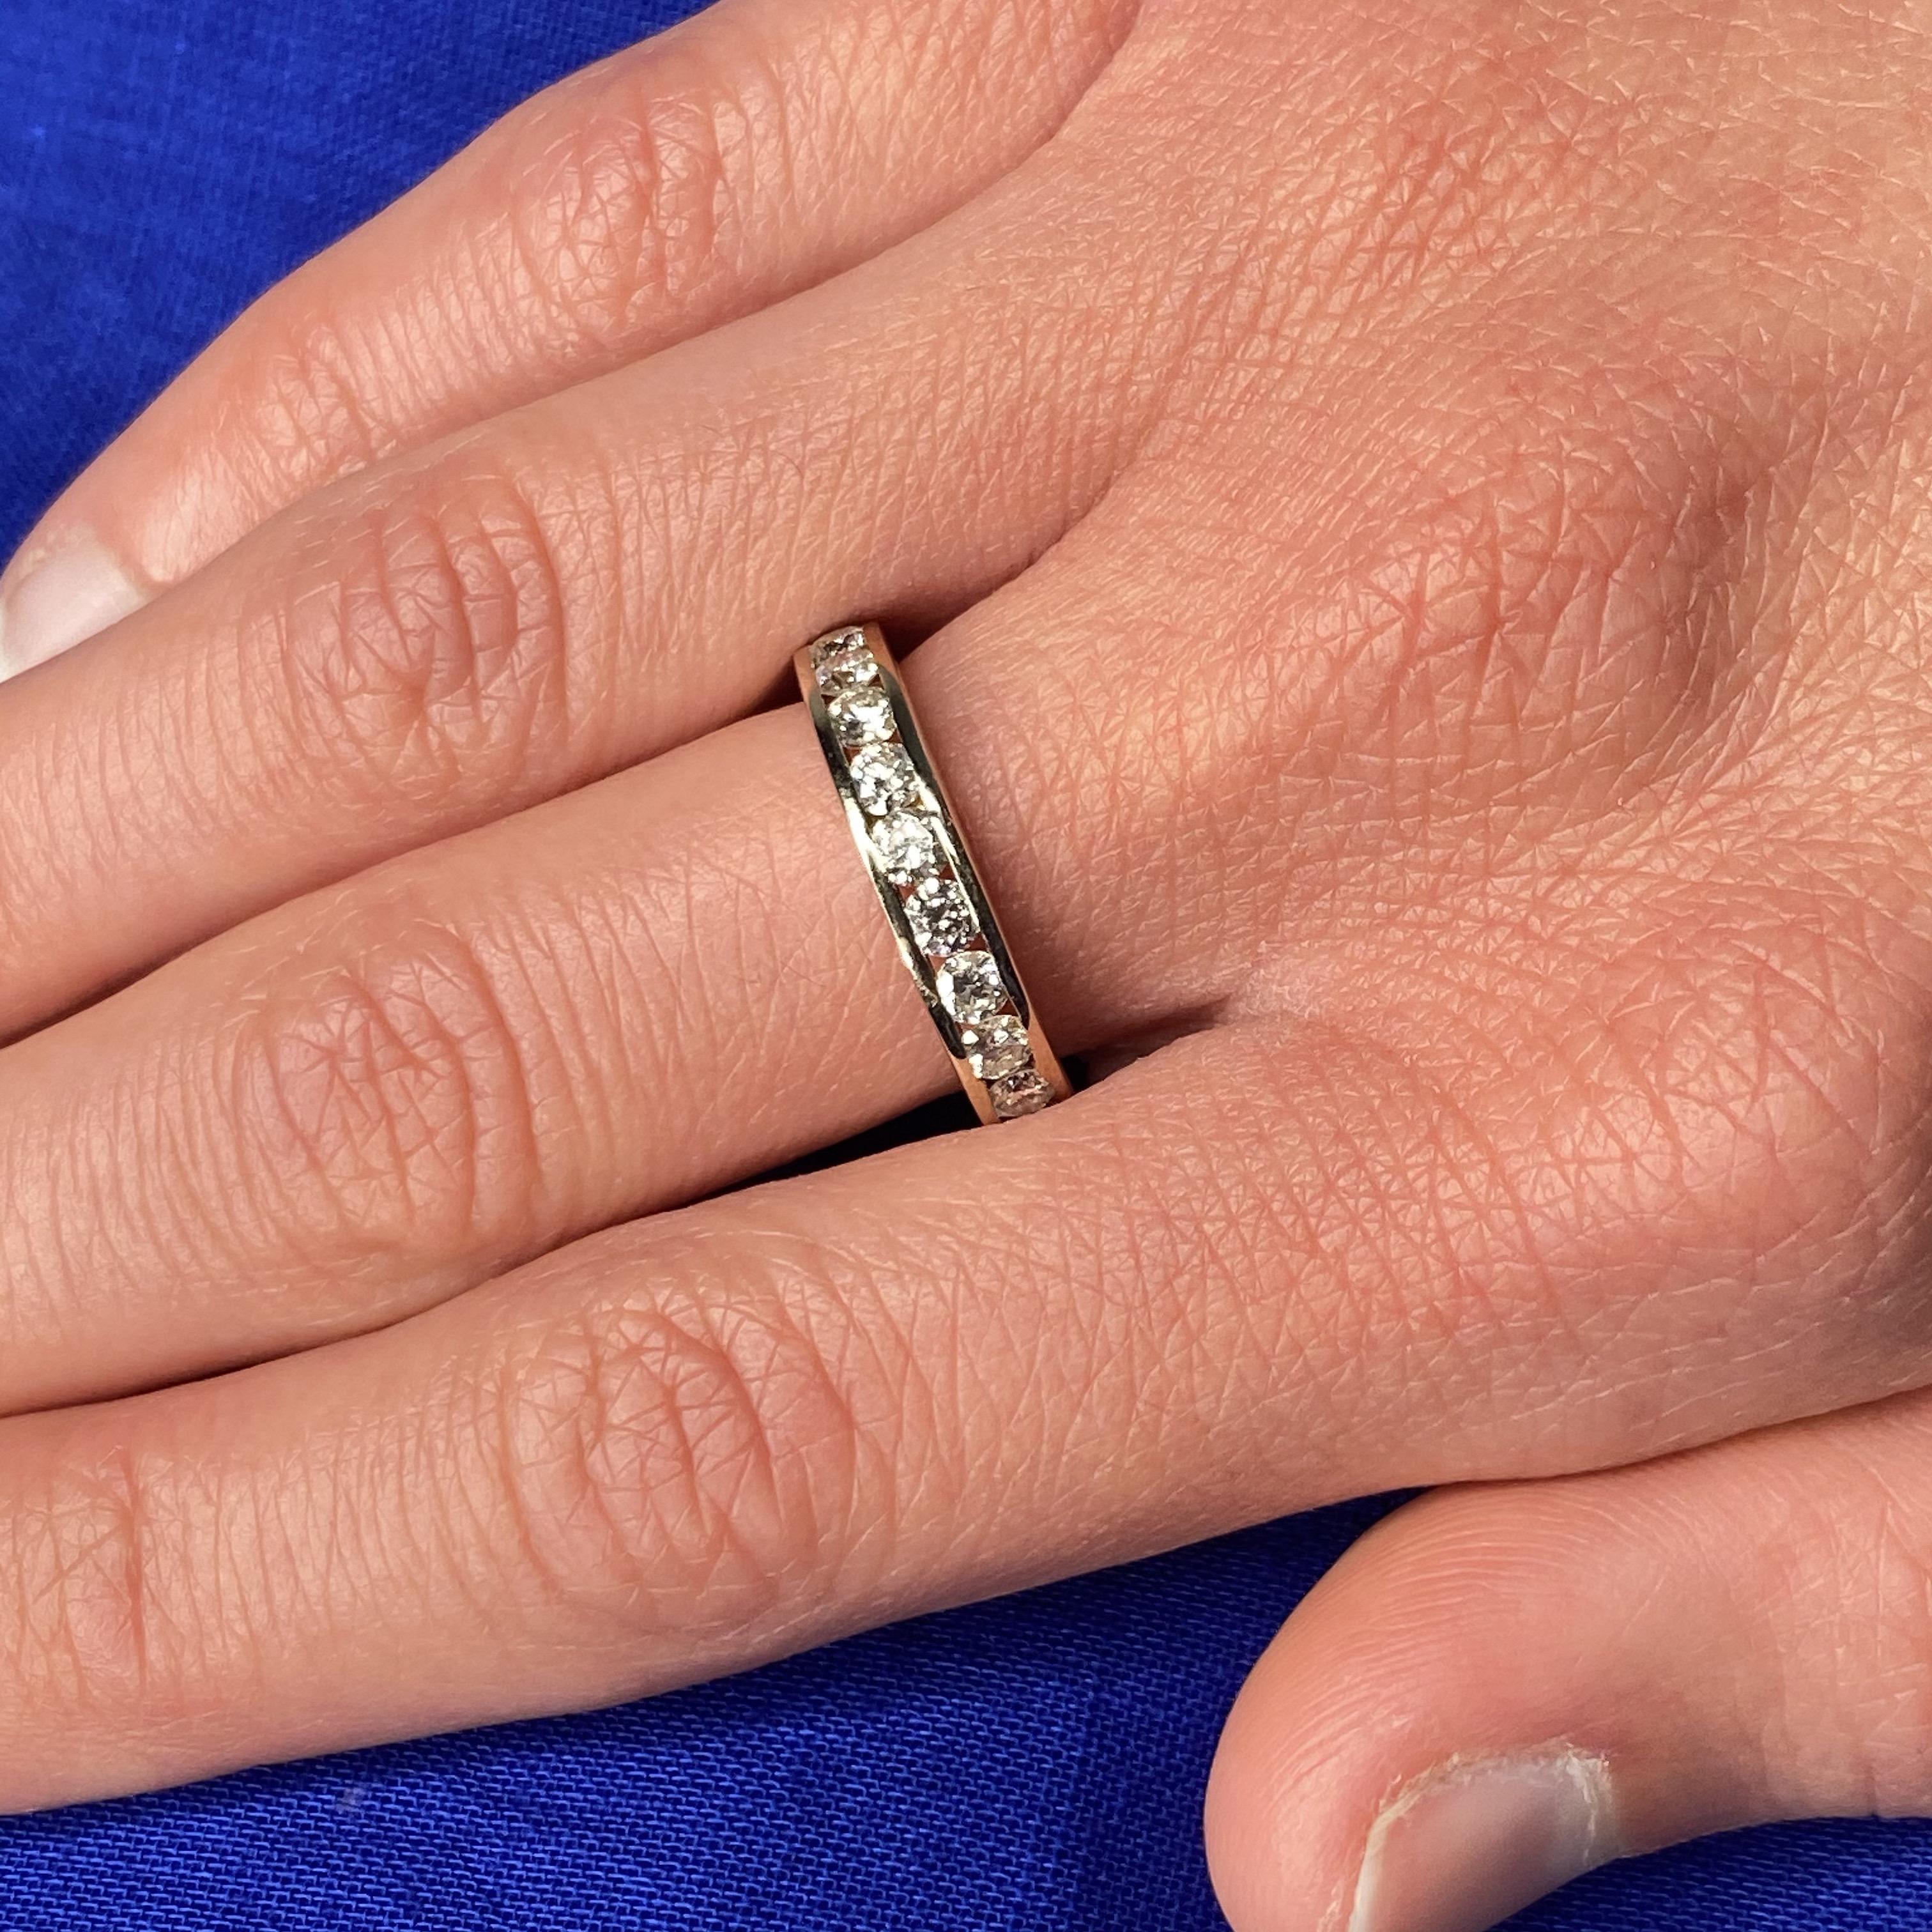 Jewellery - Image 2 of 2